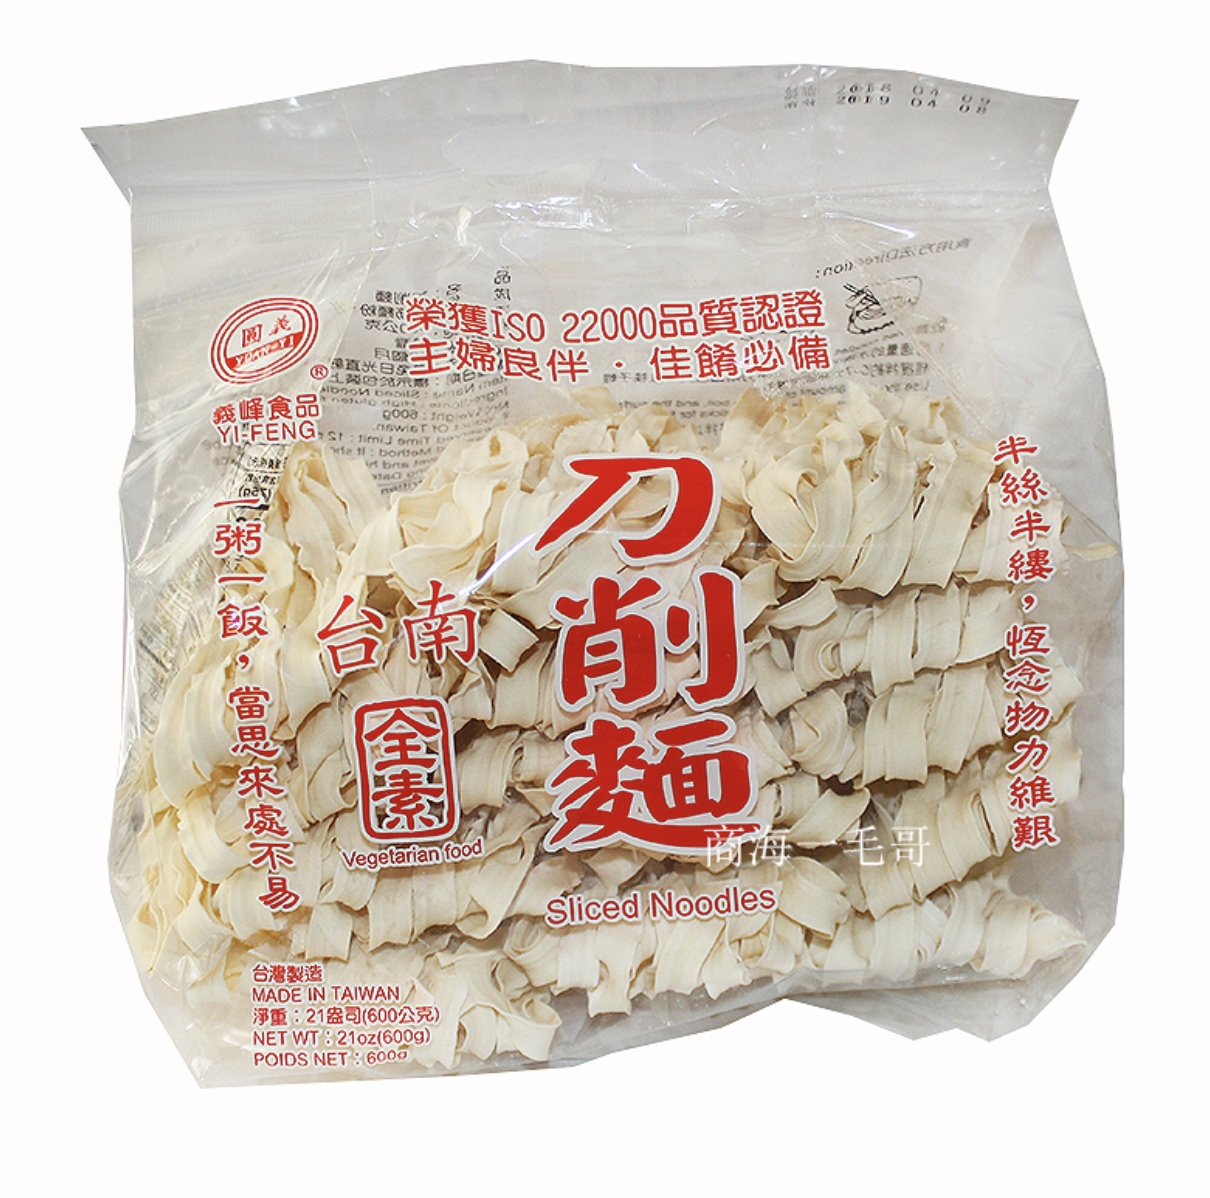 GROC【杂货】园义 台南刀削面 全素 ~600g(21oz)